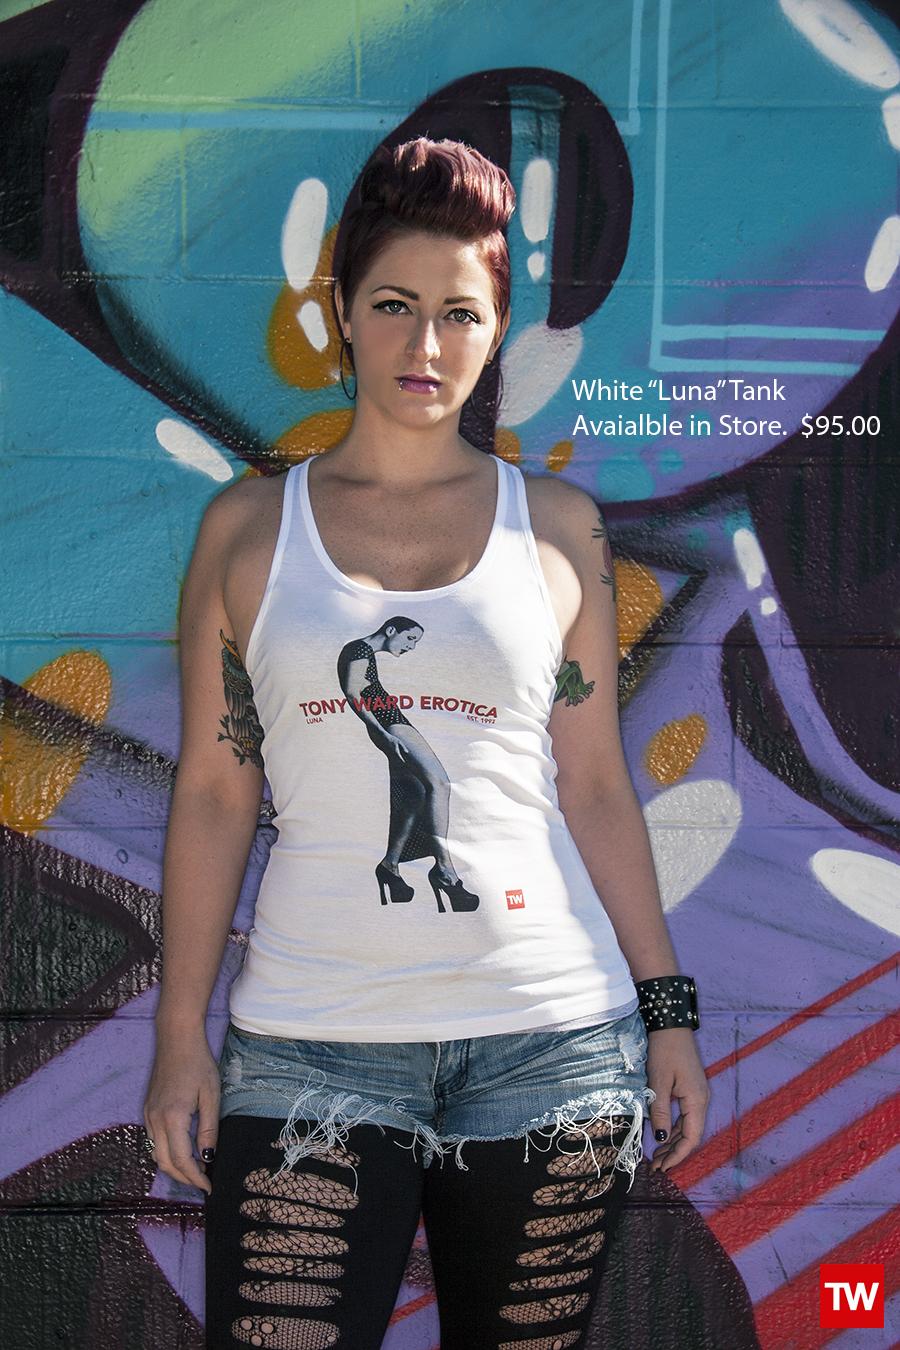 Tony_Ward_Studio_e_commerce_store_t-shirts_white_Luna_tank_sale_model_Mindy